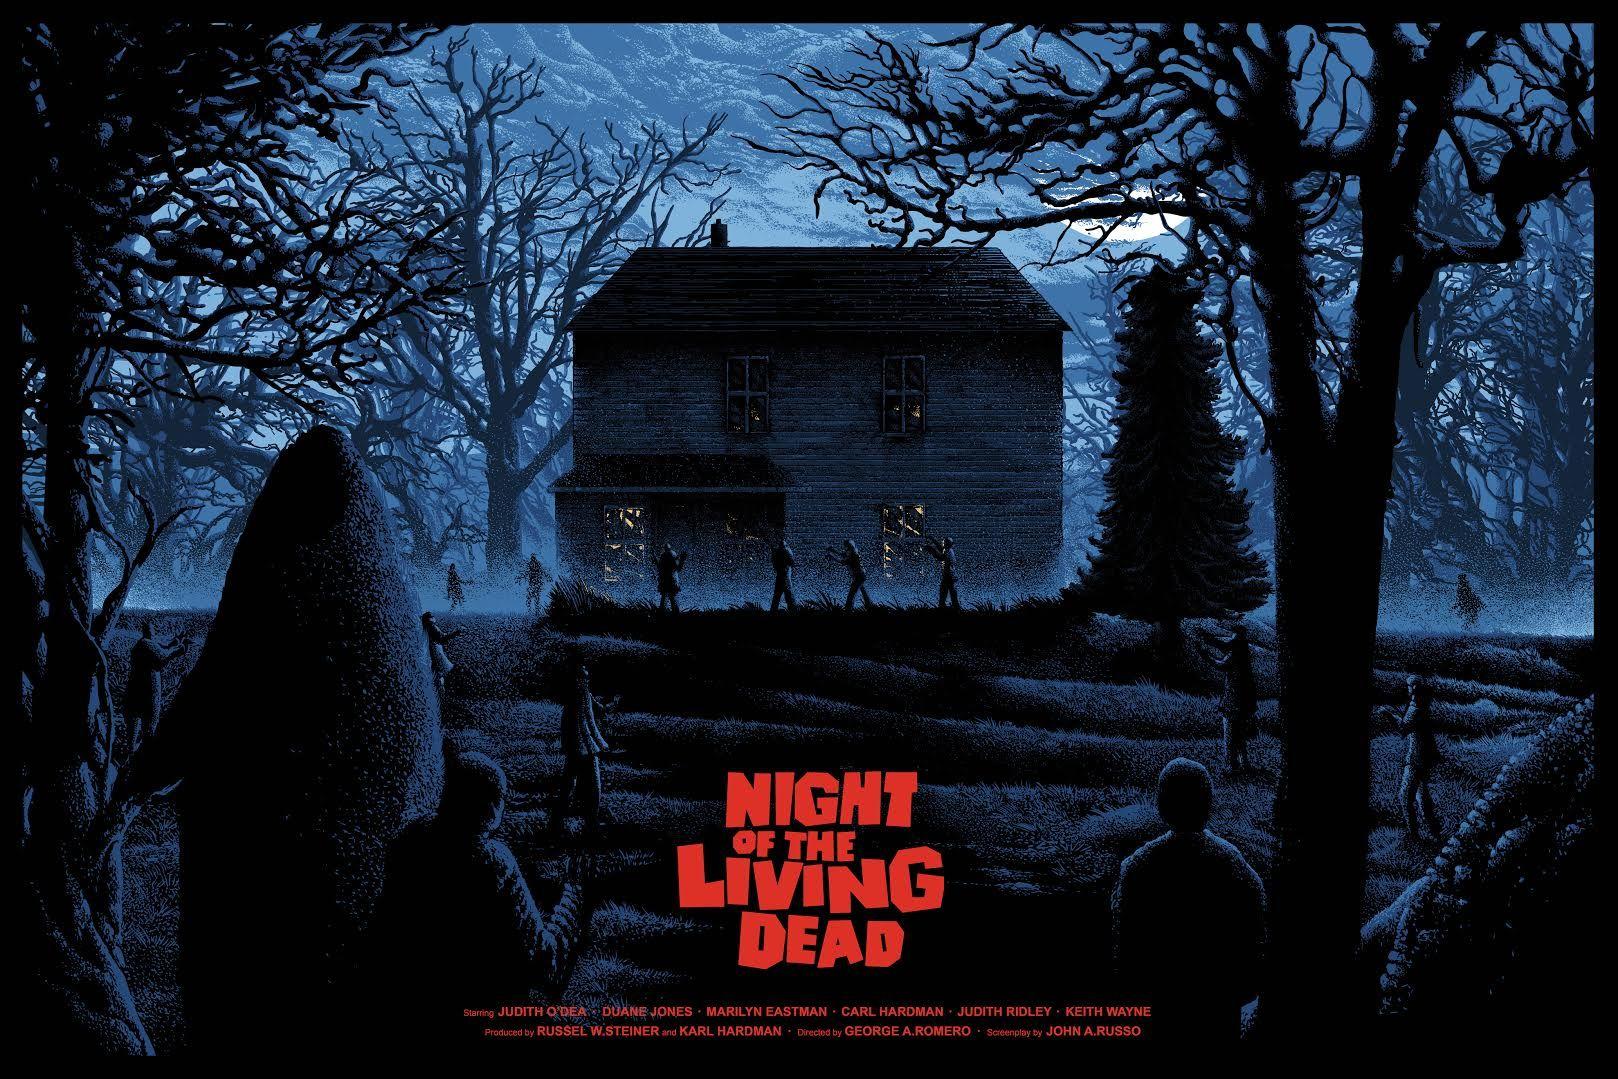 Night of the Living Dead by Kilian Eng | Grey matter art, Kilian ...